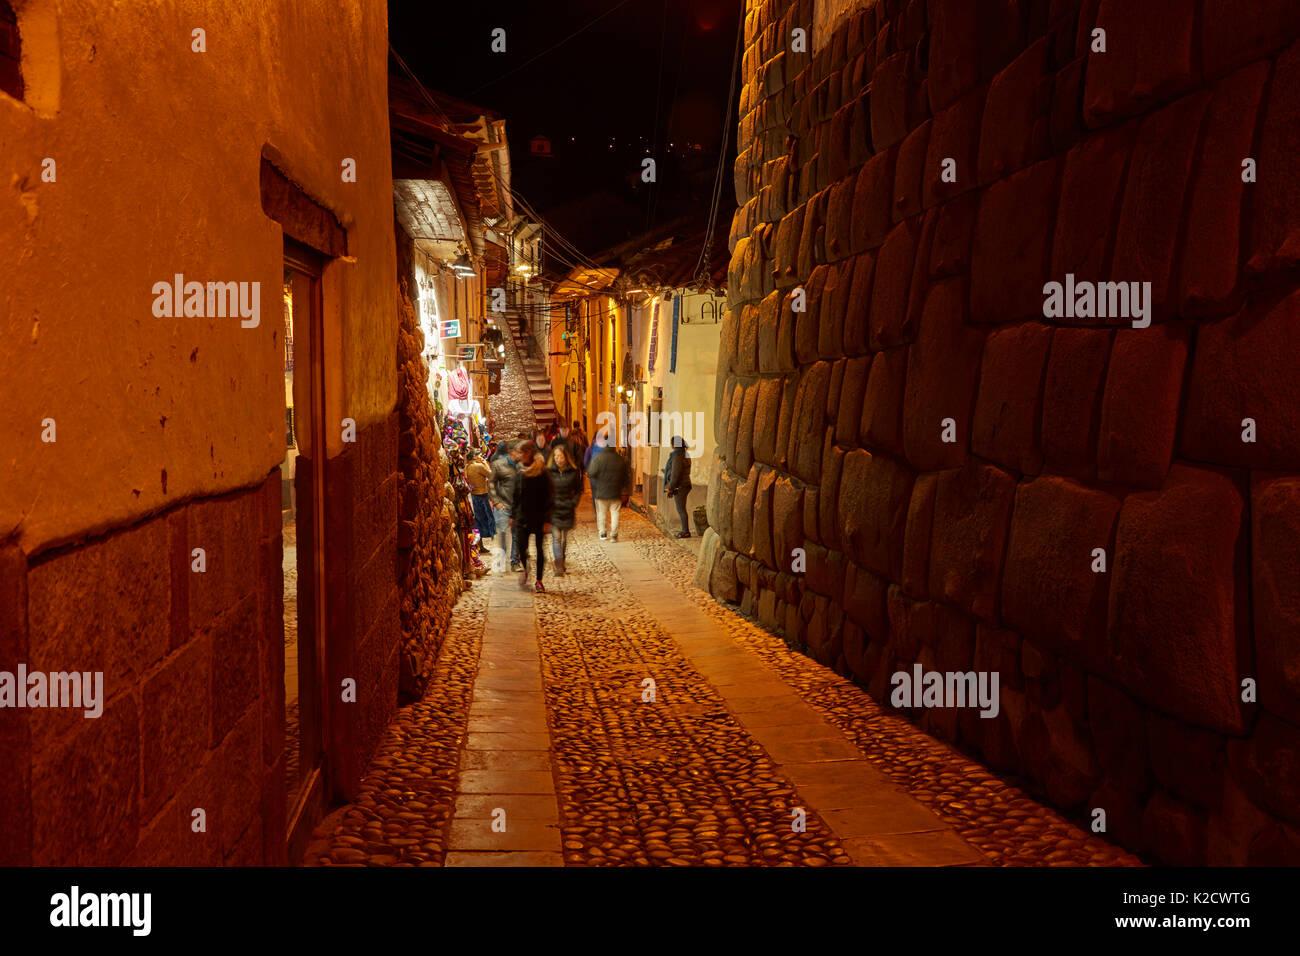 Historic Inca stonework on Calle Hatunrumiyoc at night, Cusco, Peru, South America - Stock Image